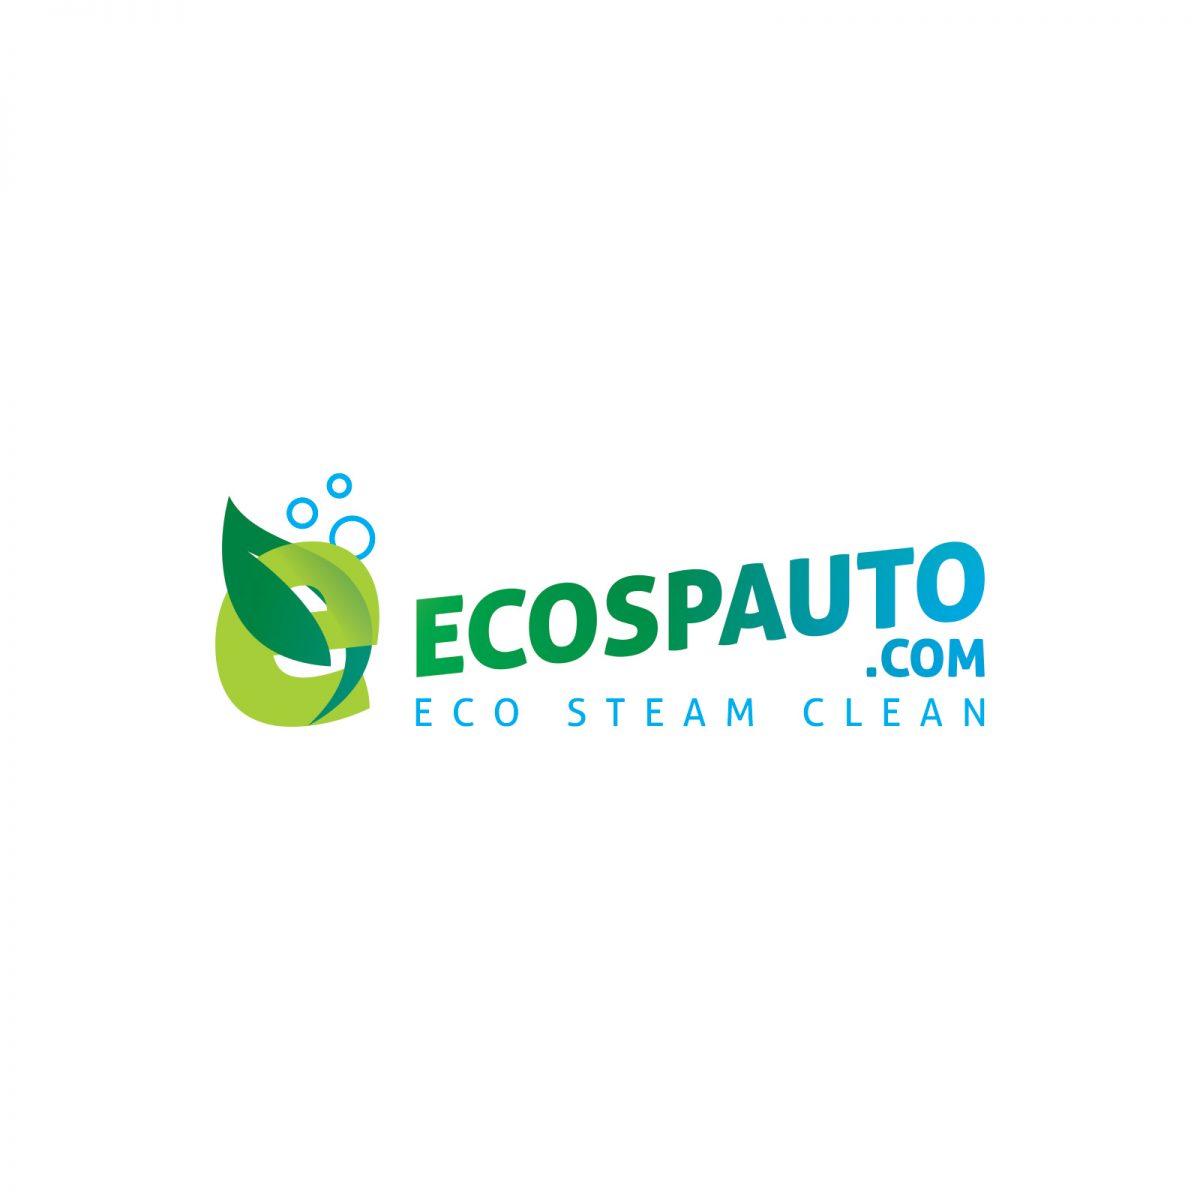 logotipo ecospauto